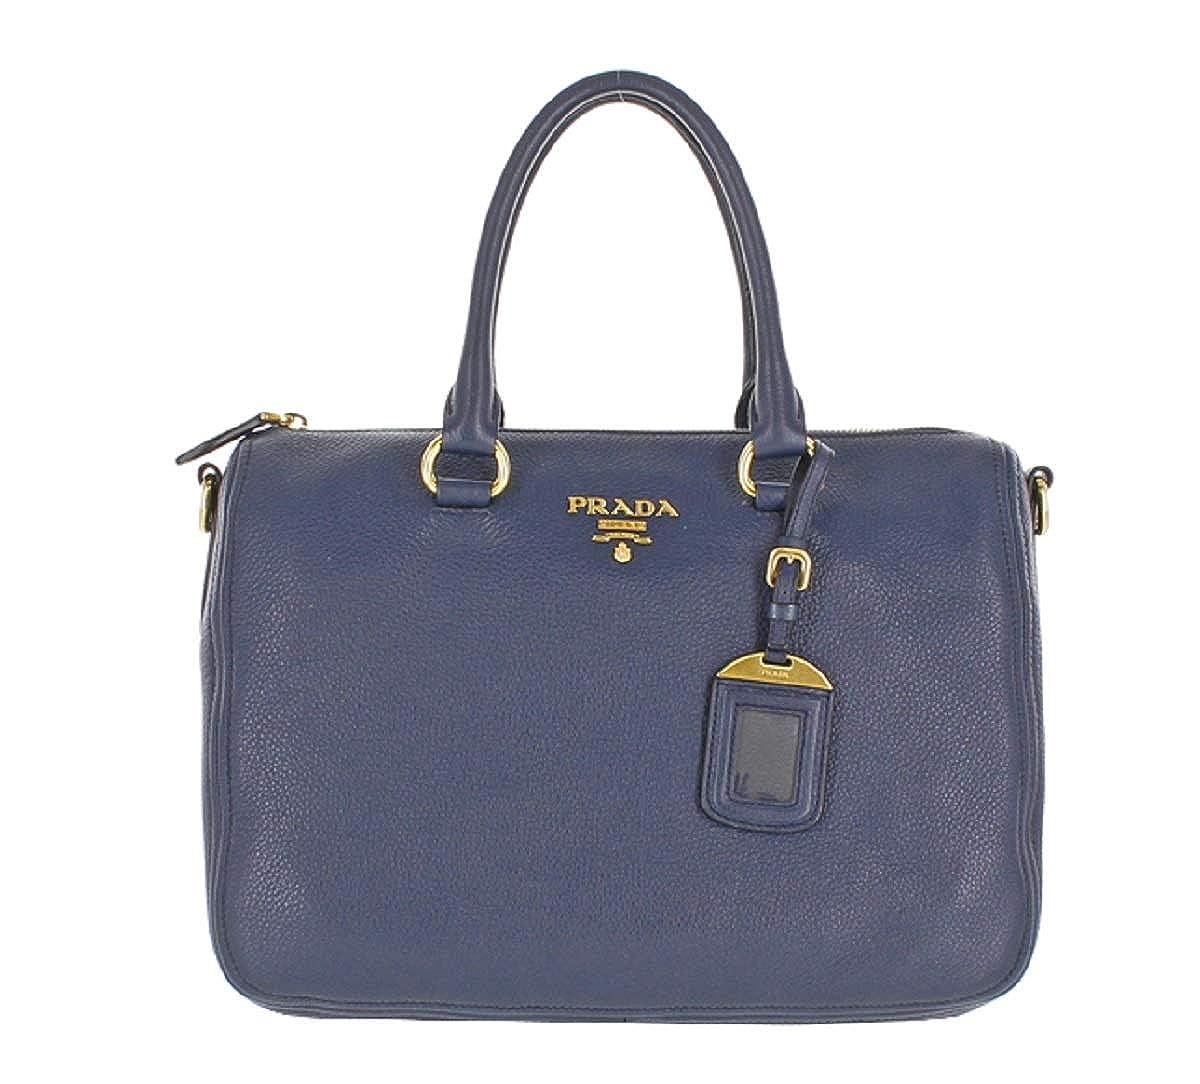 b1f70234a5 Prada Bauletto Women's Navy Baltico Vitello Phenix Handbag 1BB023:  Handbags: Amazon.com